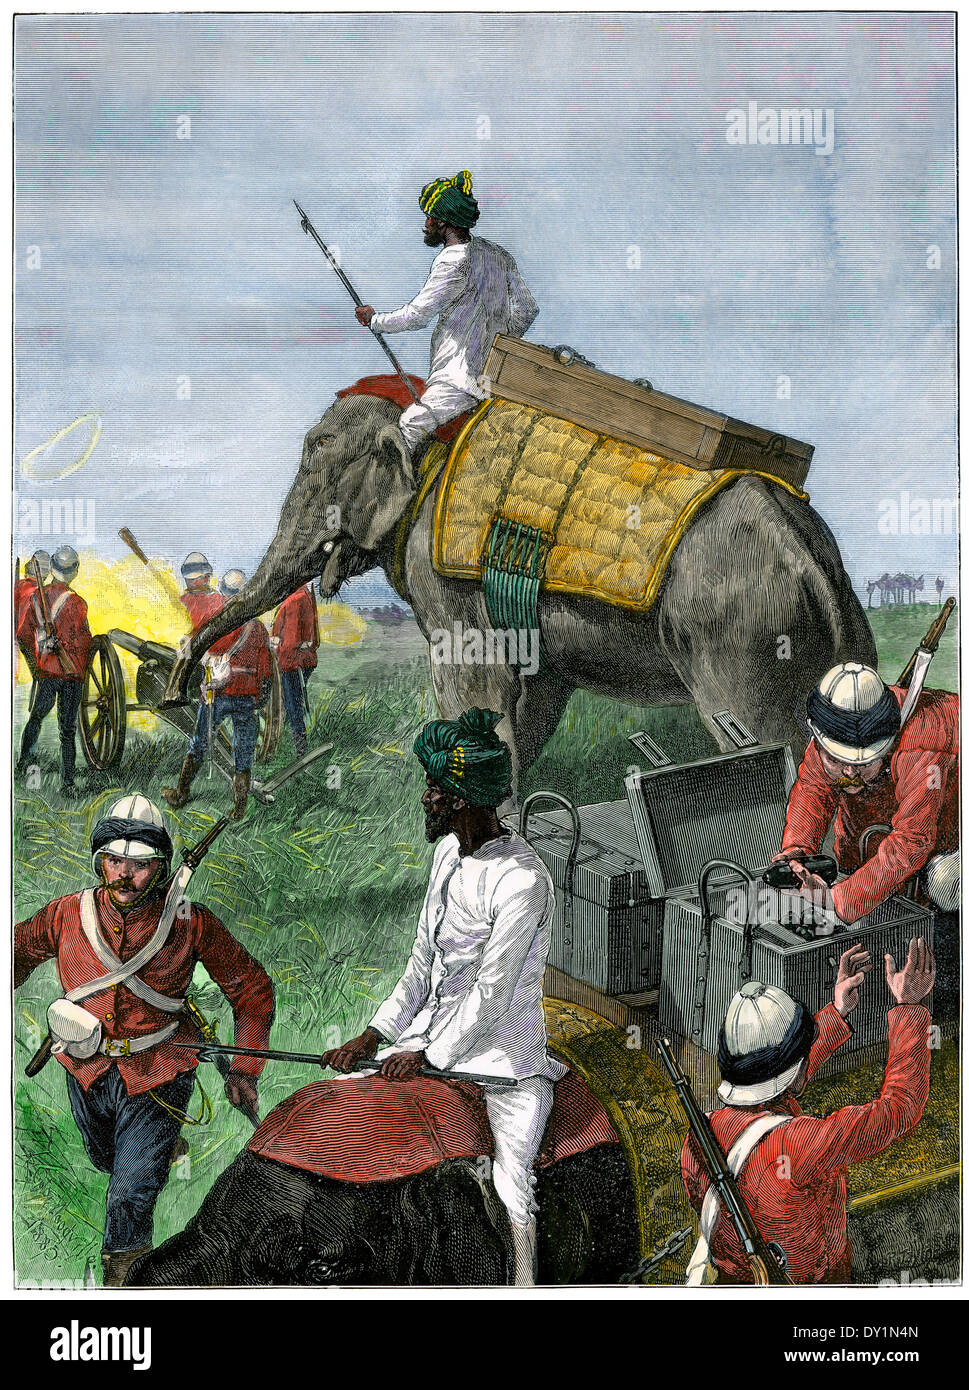 Elefanten in Nutzung durch britische Artillerie-Regiment in Burmah (Myanmar), 1880 s. Stockbild